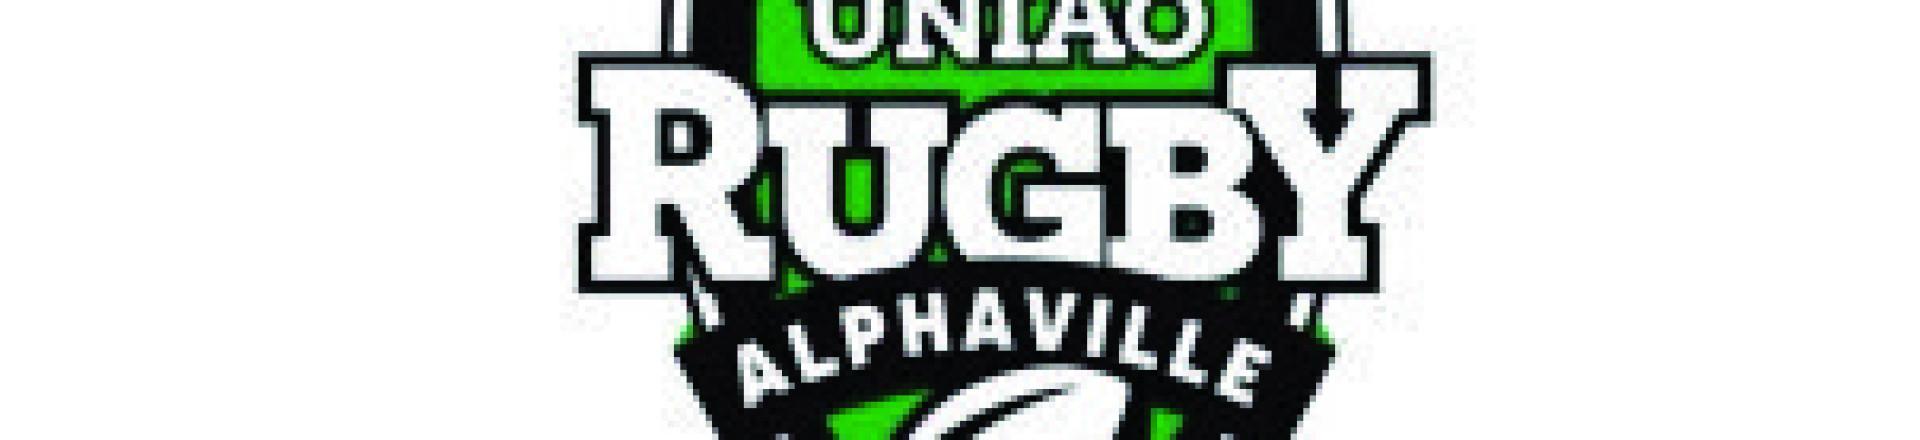 URA União Rugby Alphaville